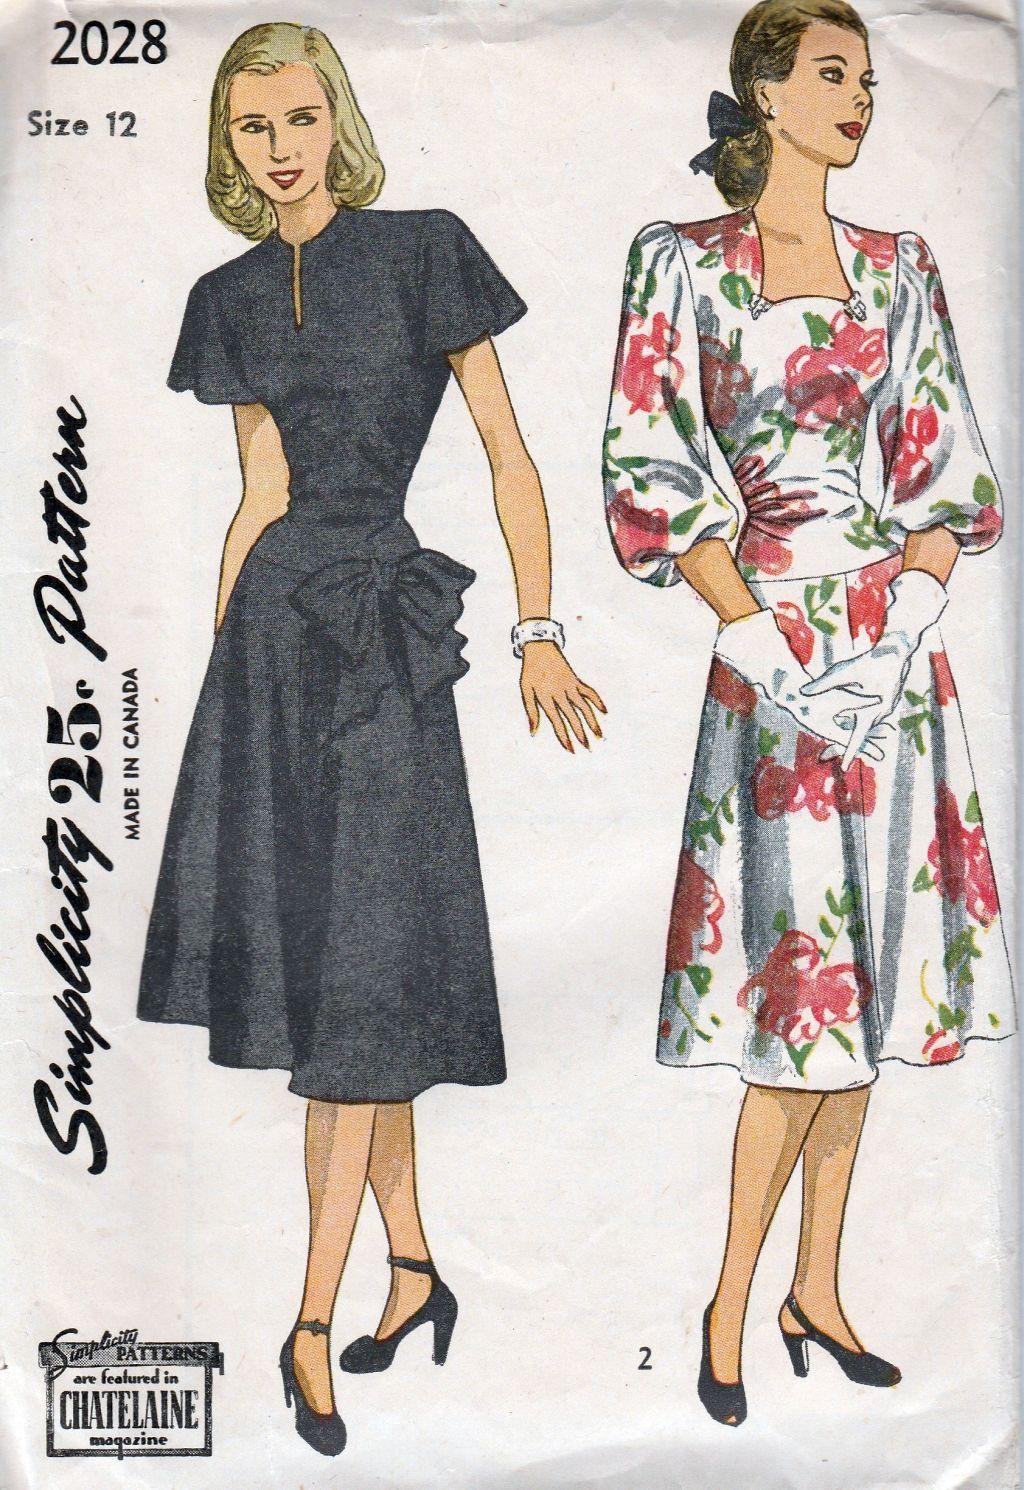 Simplicity 2028 vintage 1940s sewing pattern ladies party dress simplicity 2028 ladies dress vintage 1940s sewing pattern jeuxipadfo Choice Image